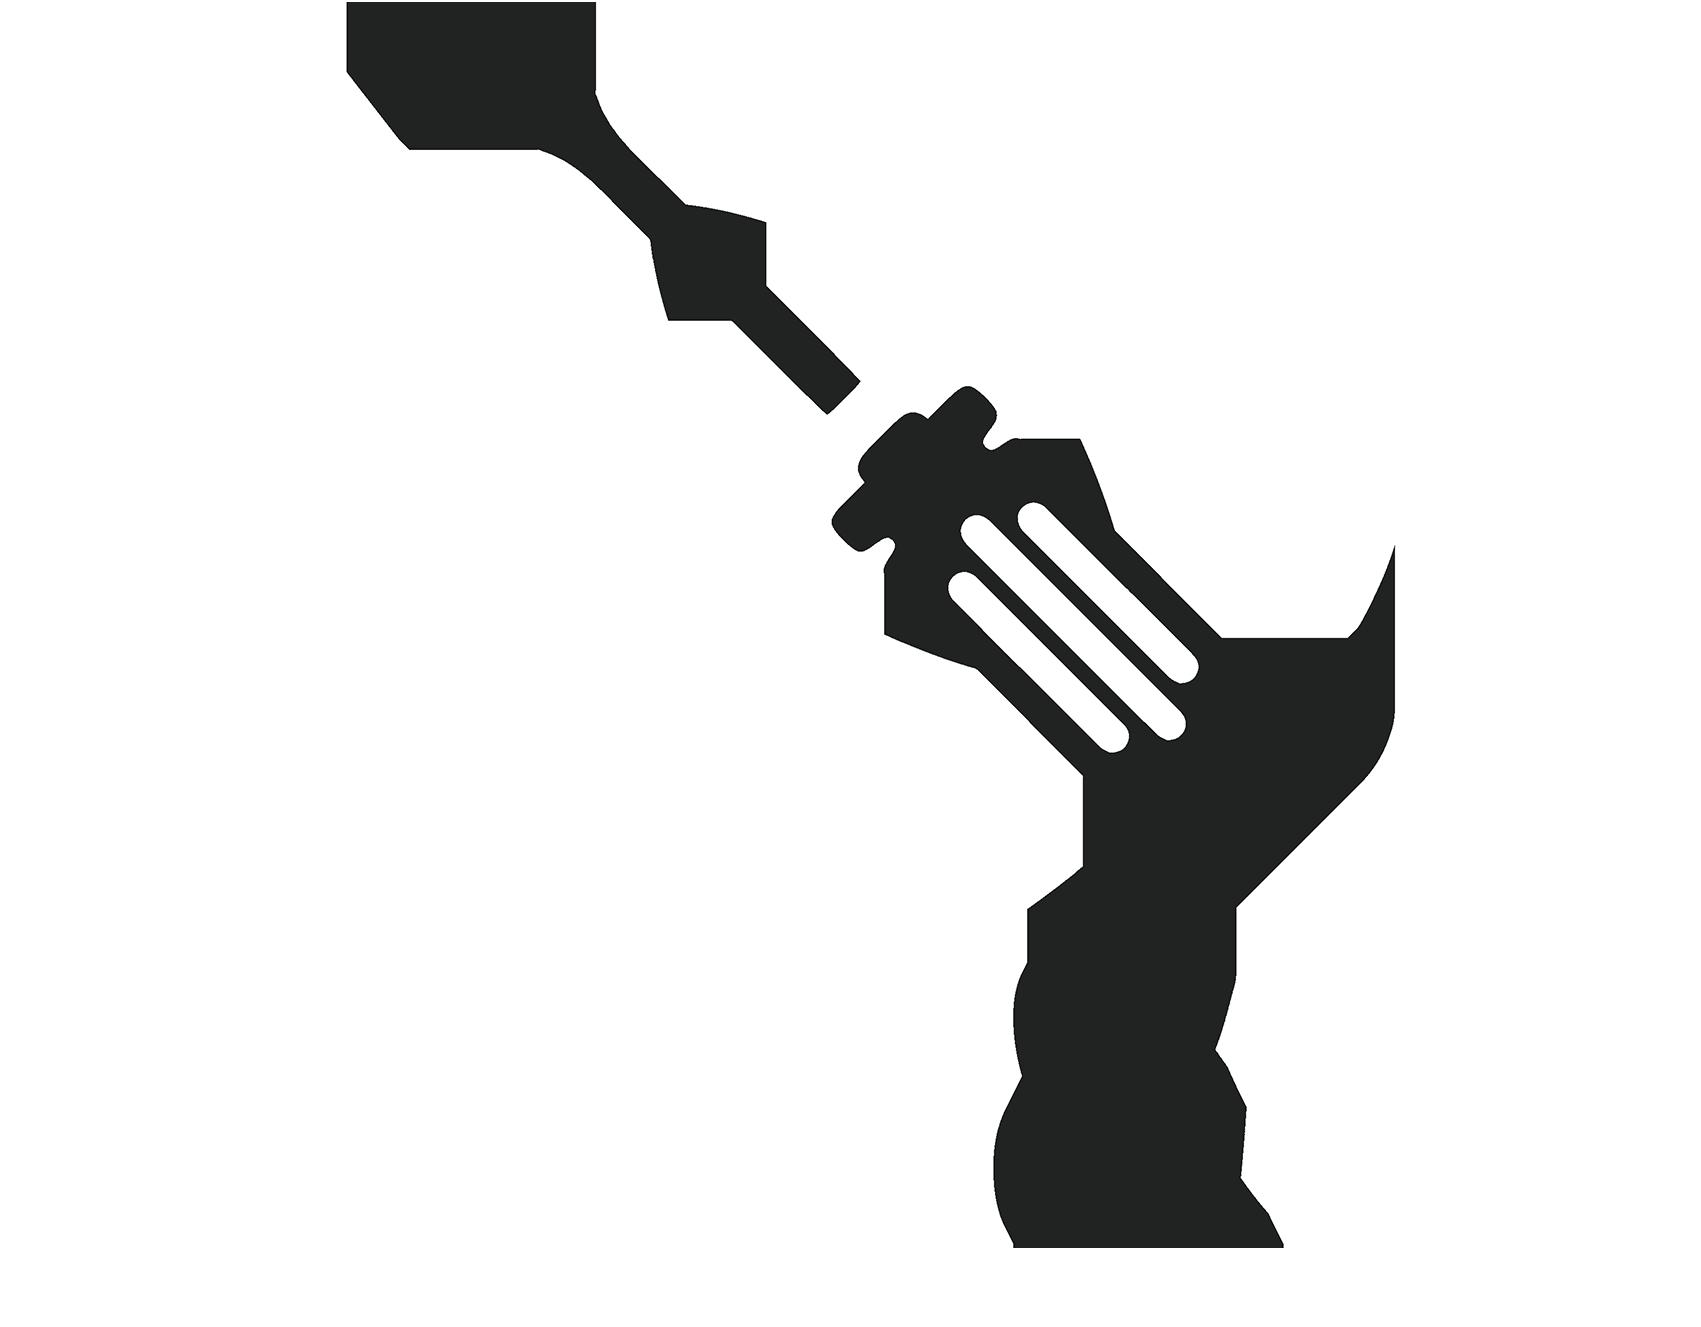 Install&Go